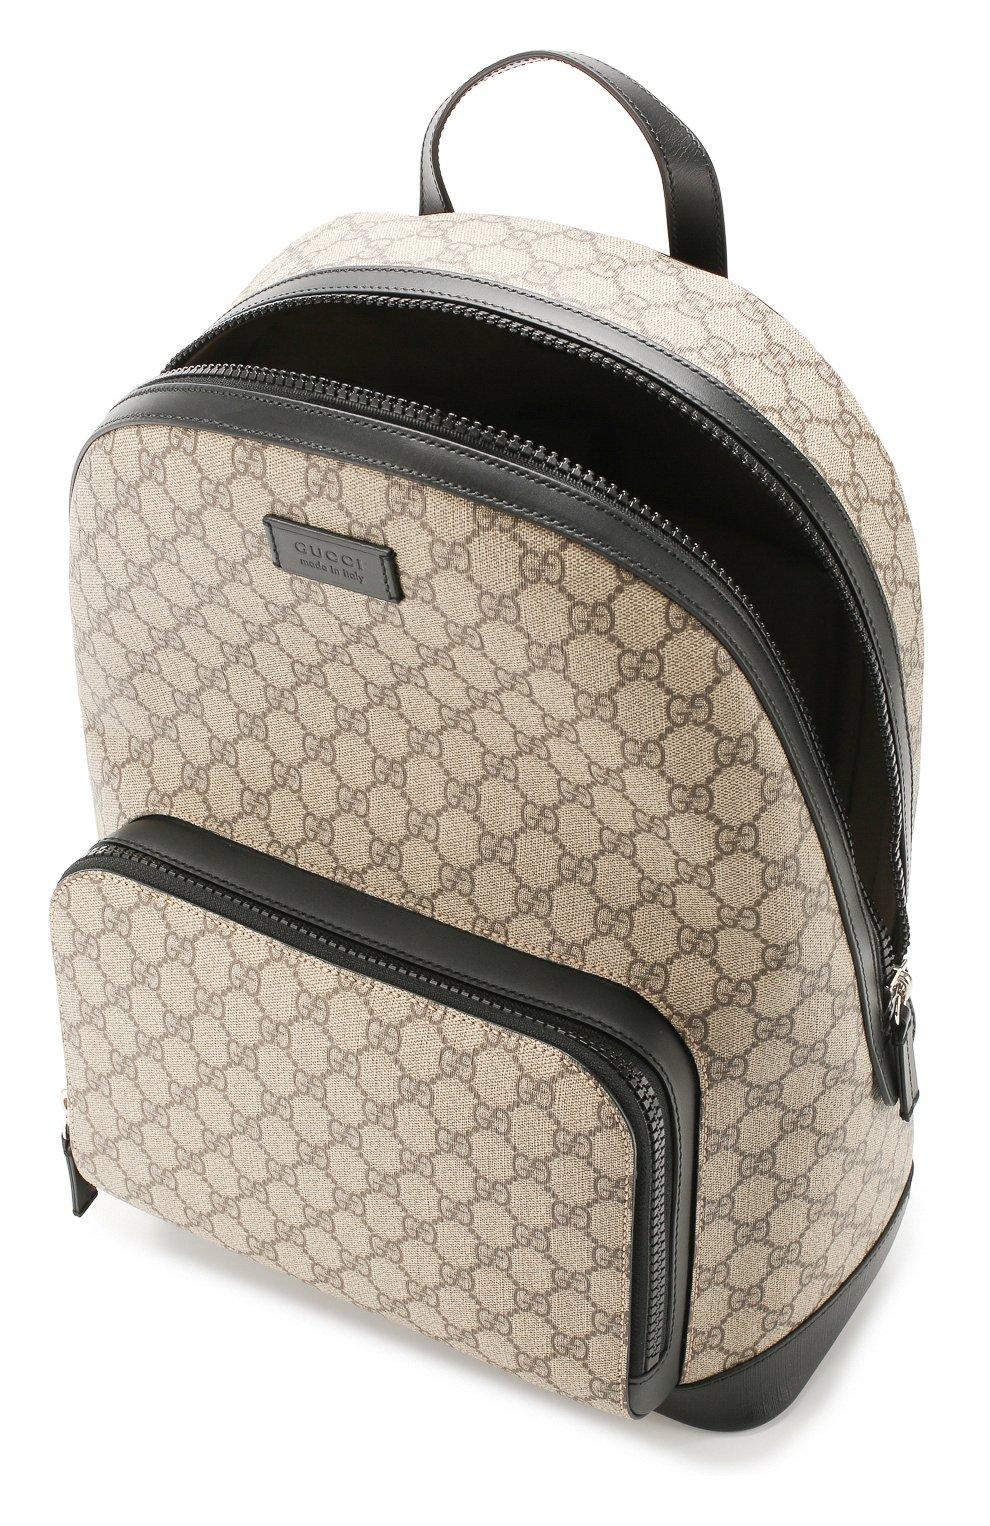 Мужские рюкзаки Gucci по цене от 50 800 руб. купить в интернет-магазине ЦУМ cc04240b6f3d2